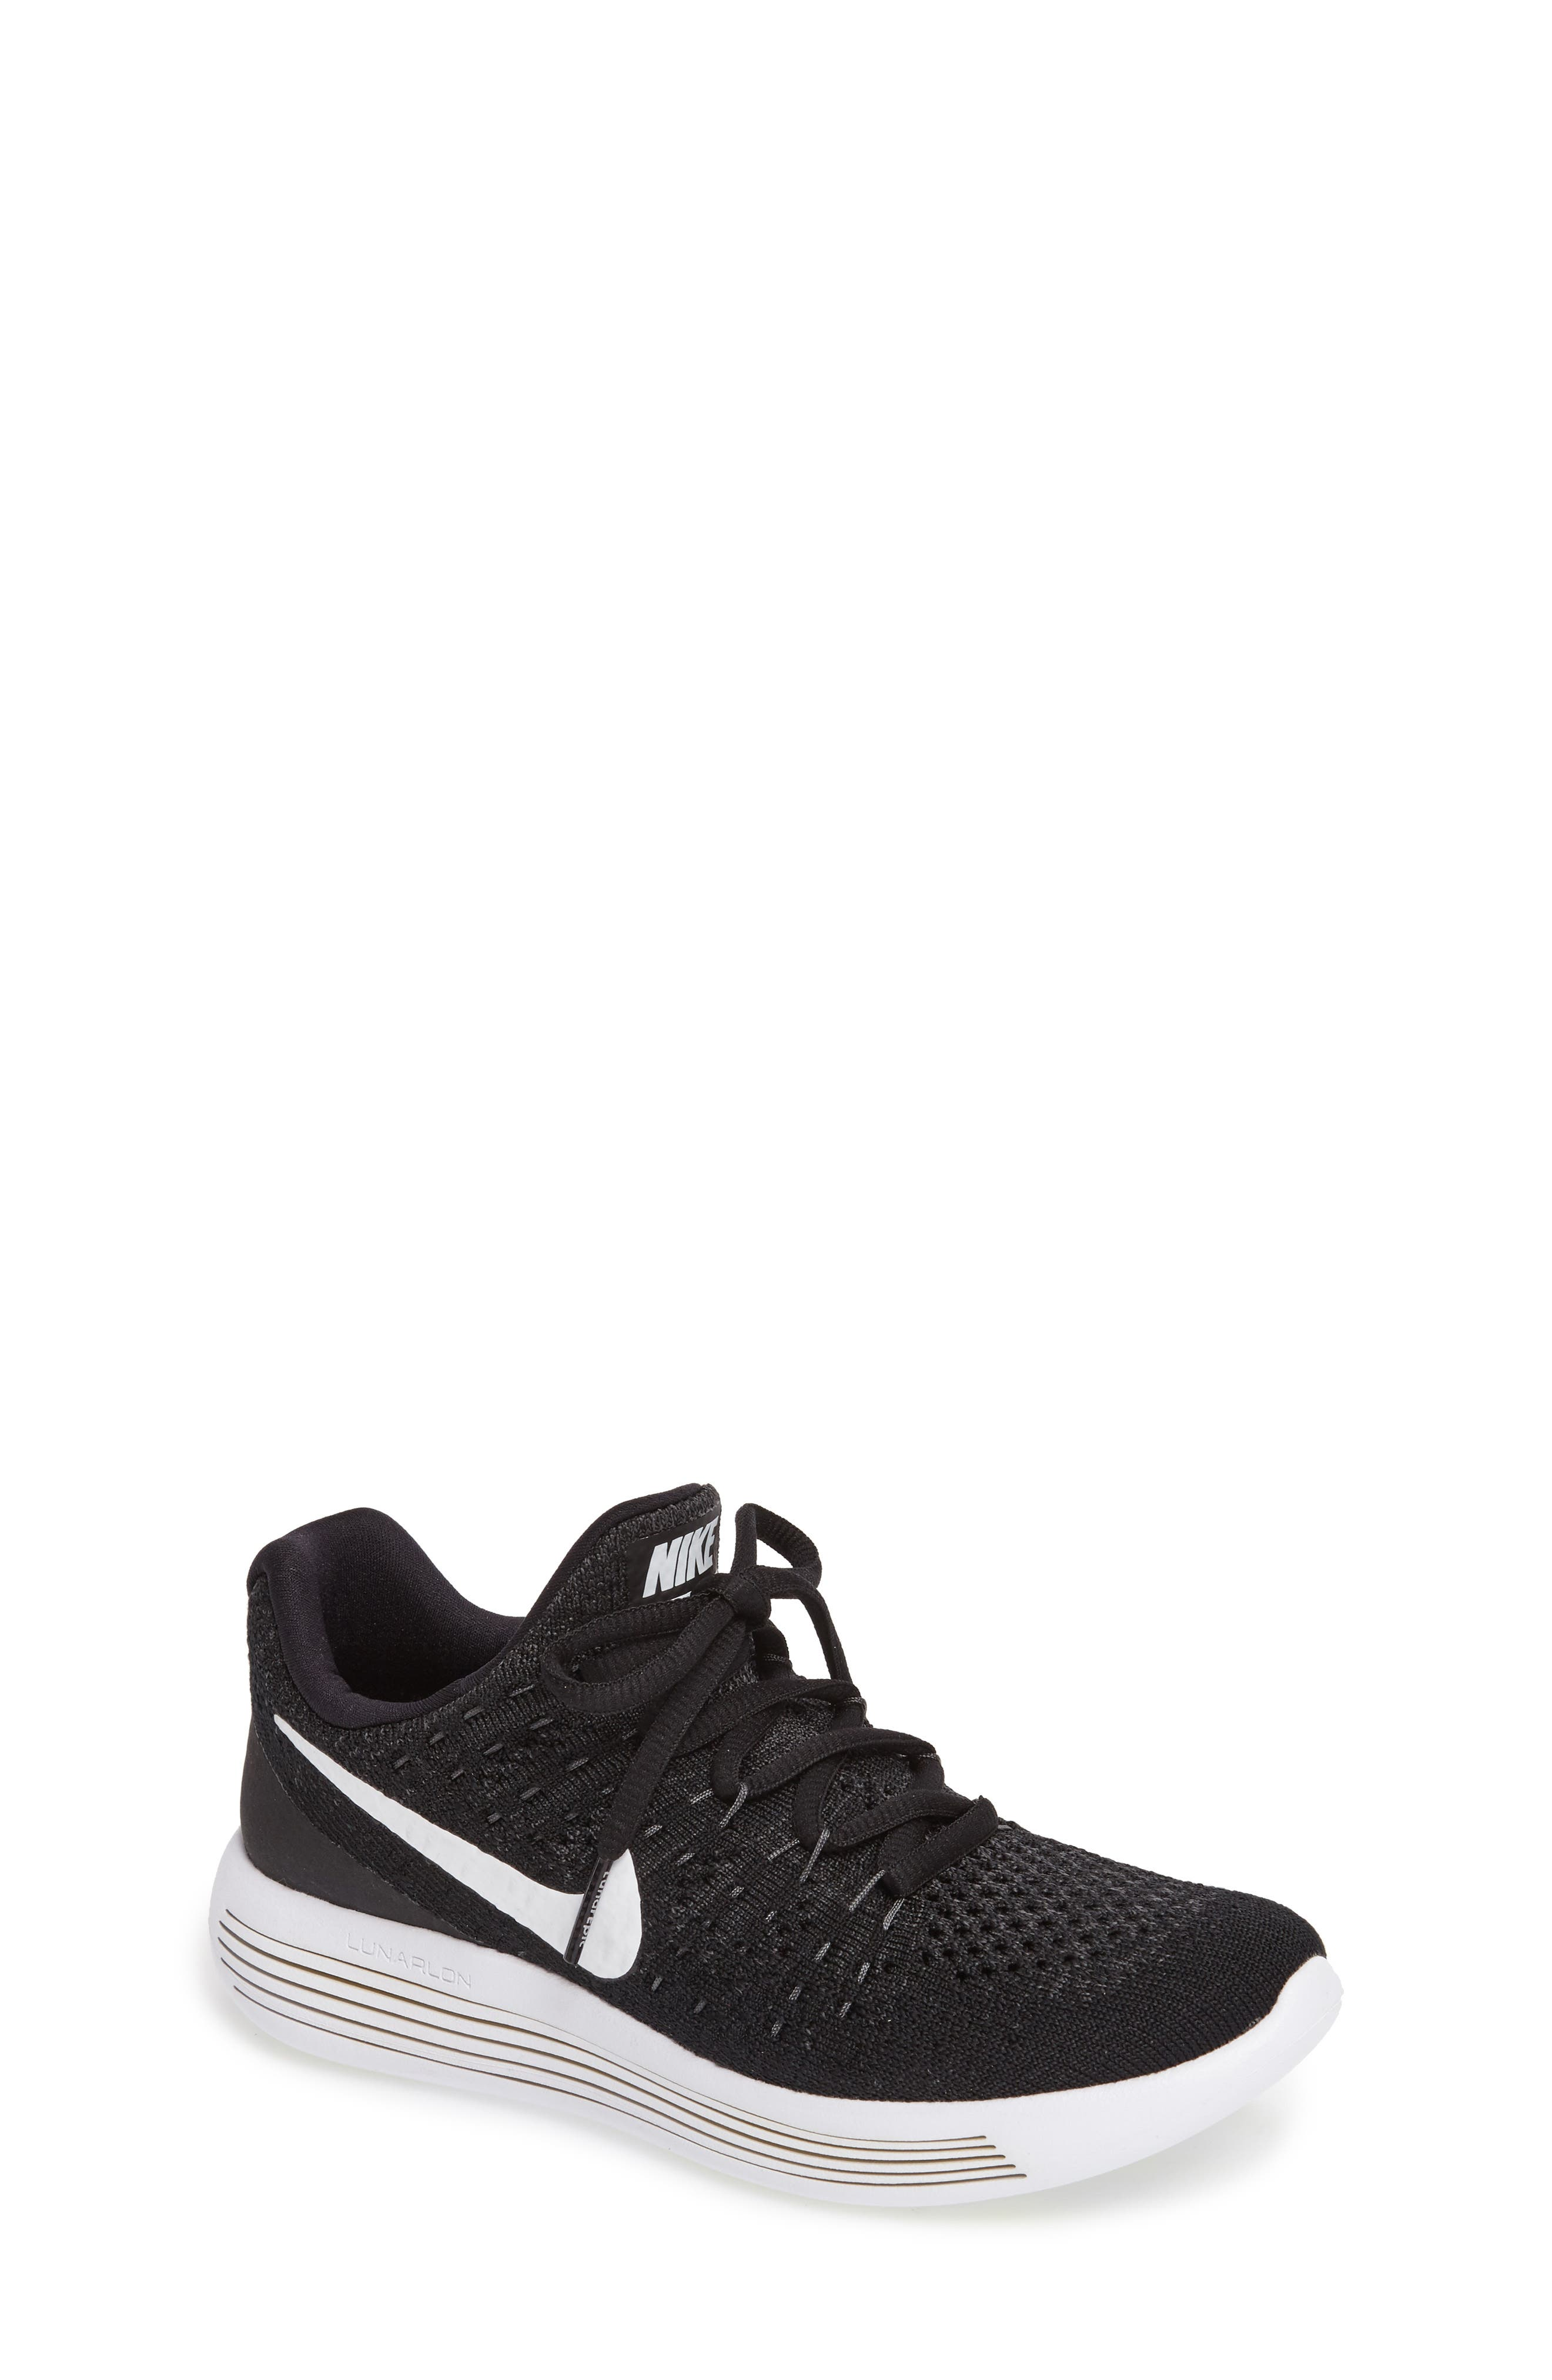 Flyknit LunarEpic Sneaker,                         Main,                         color, 001